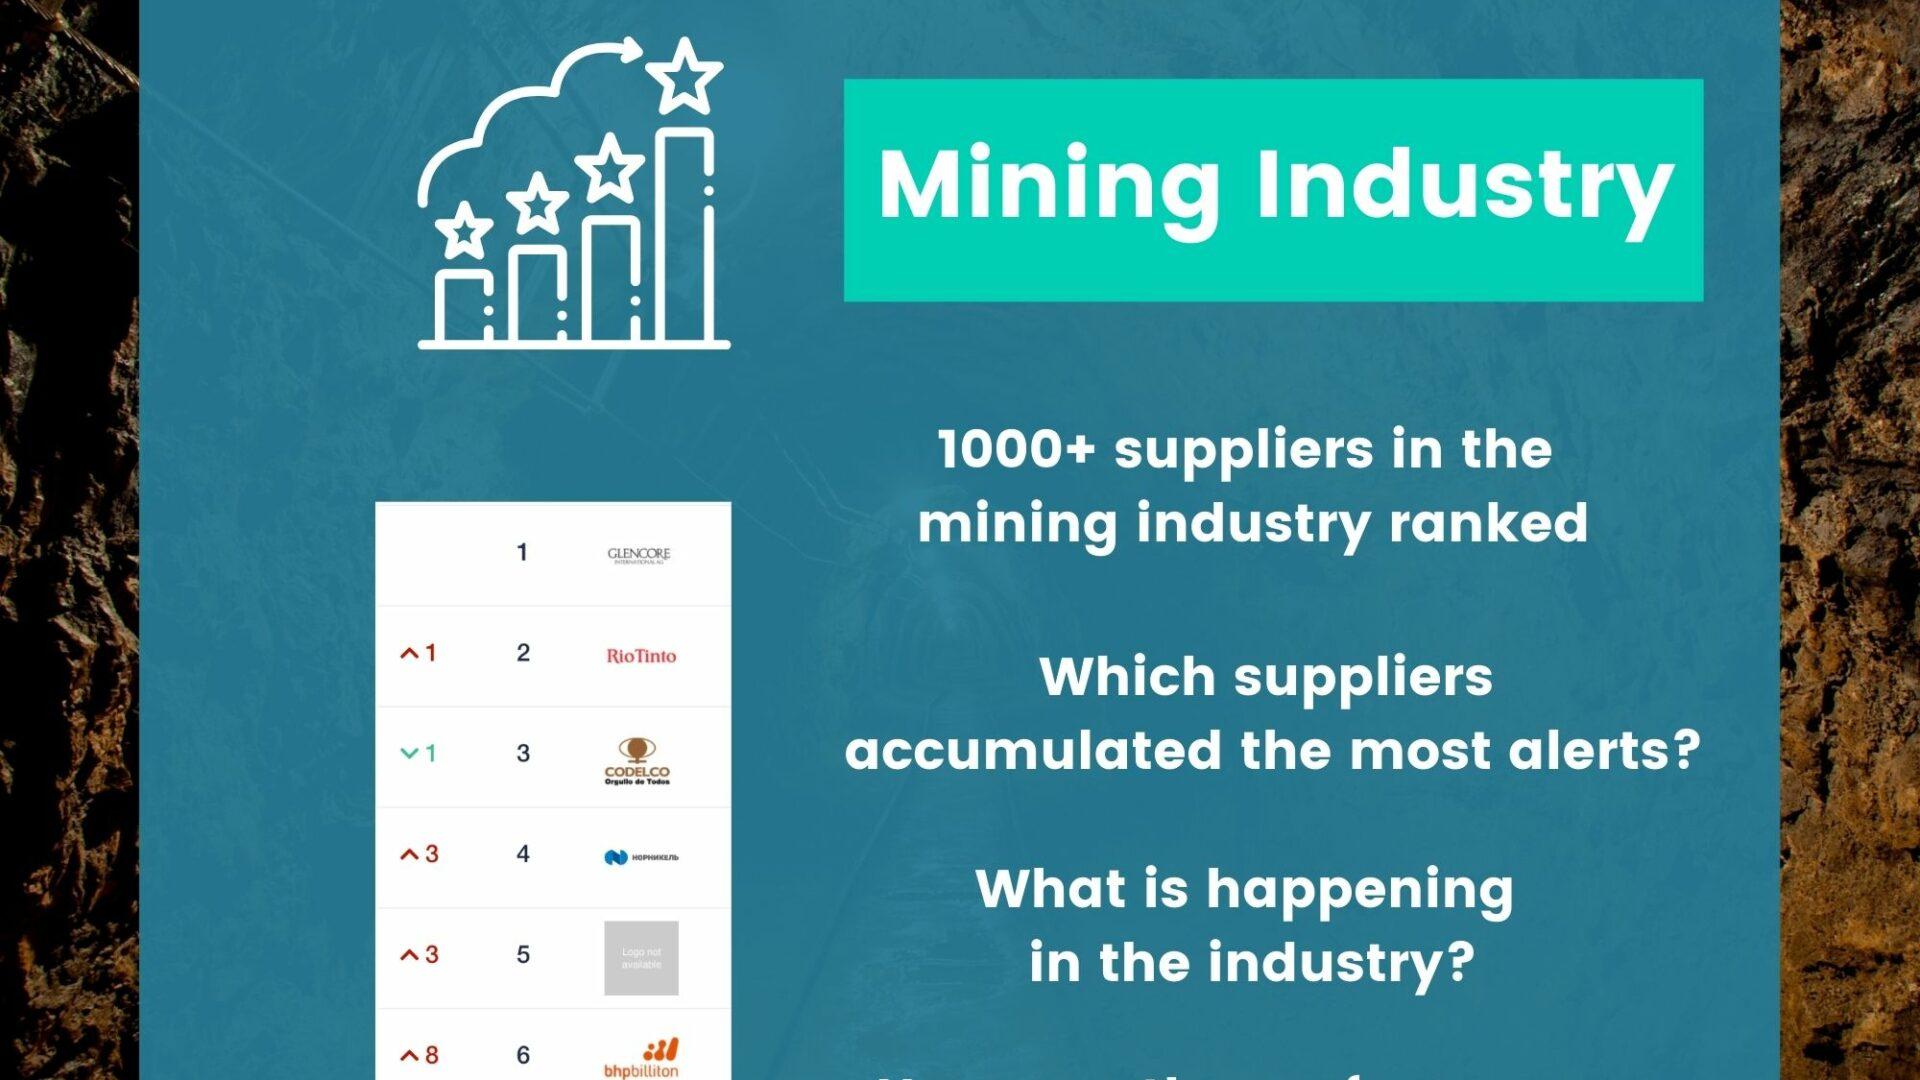 Prewave Sustainability Risk Ranking Mining